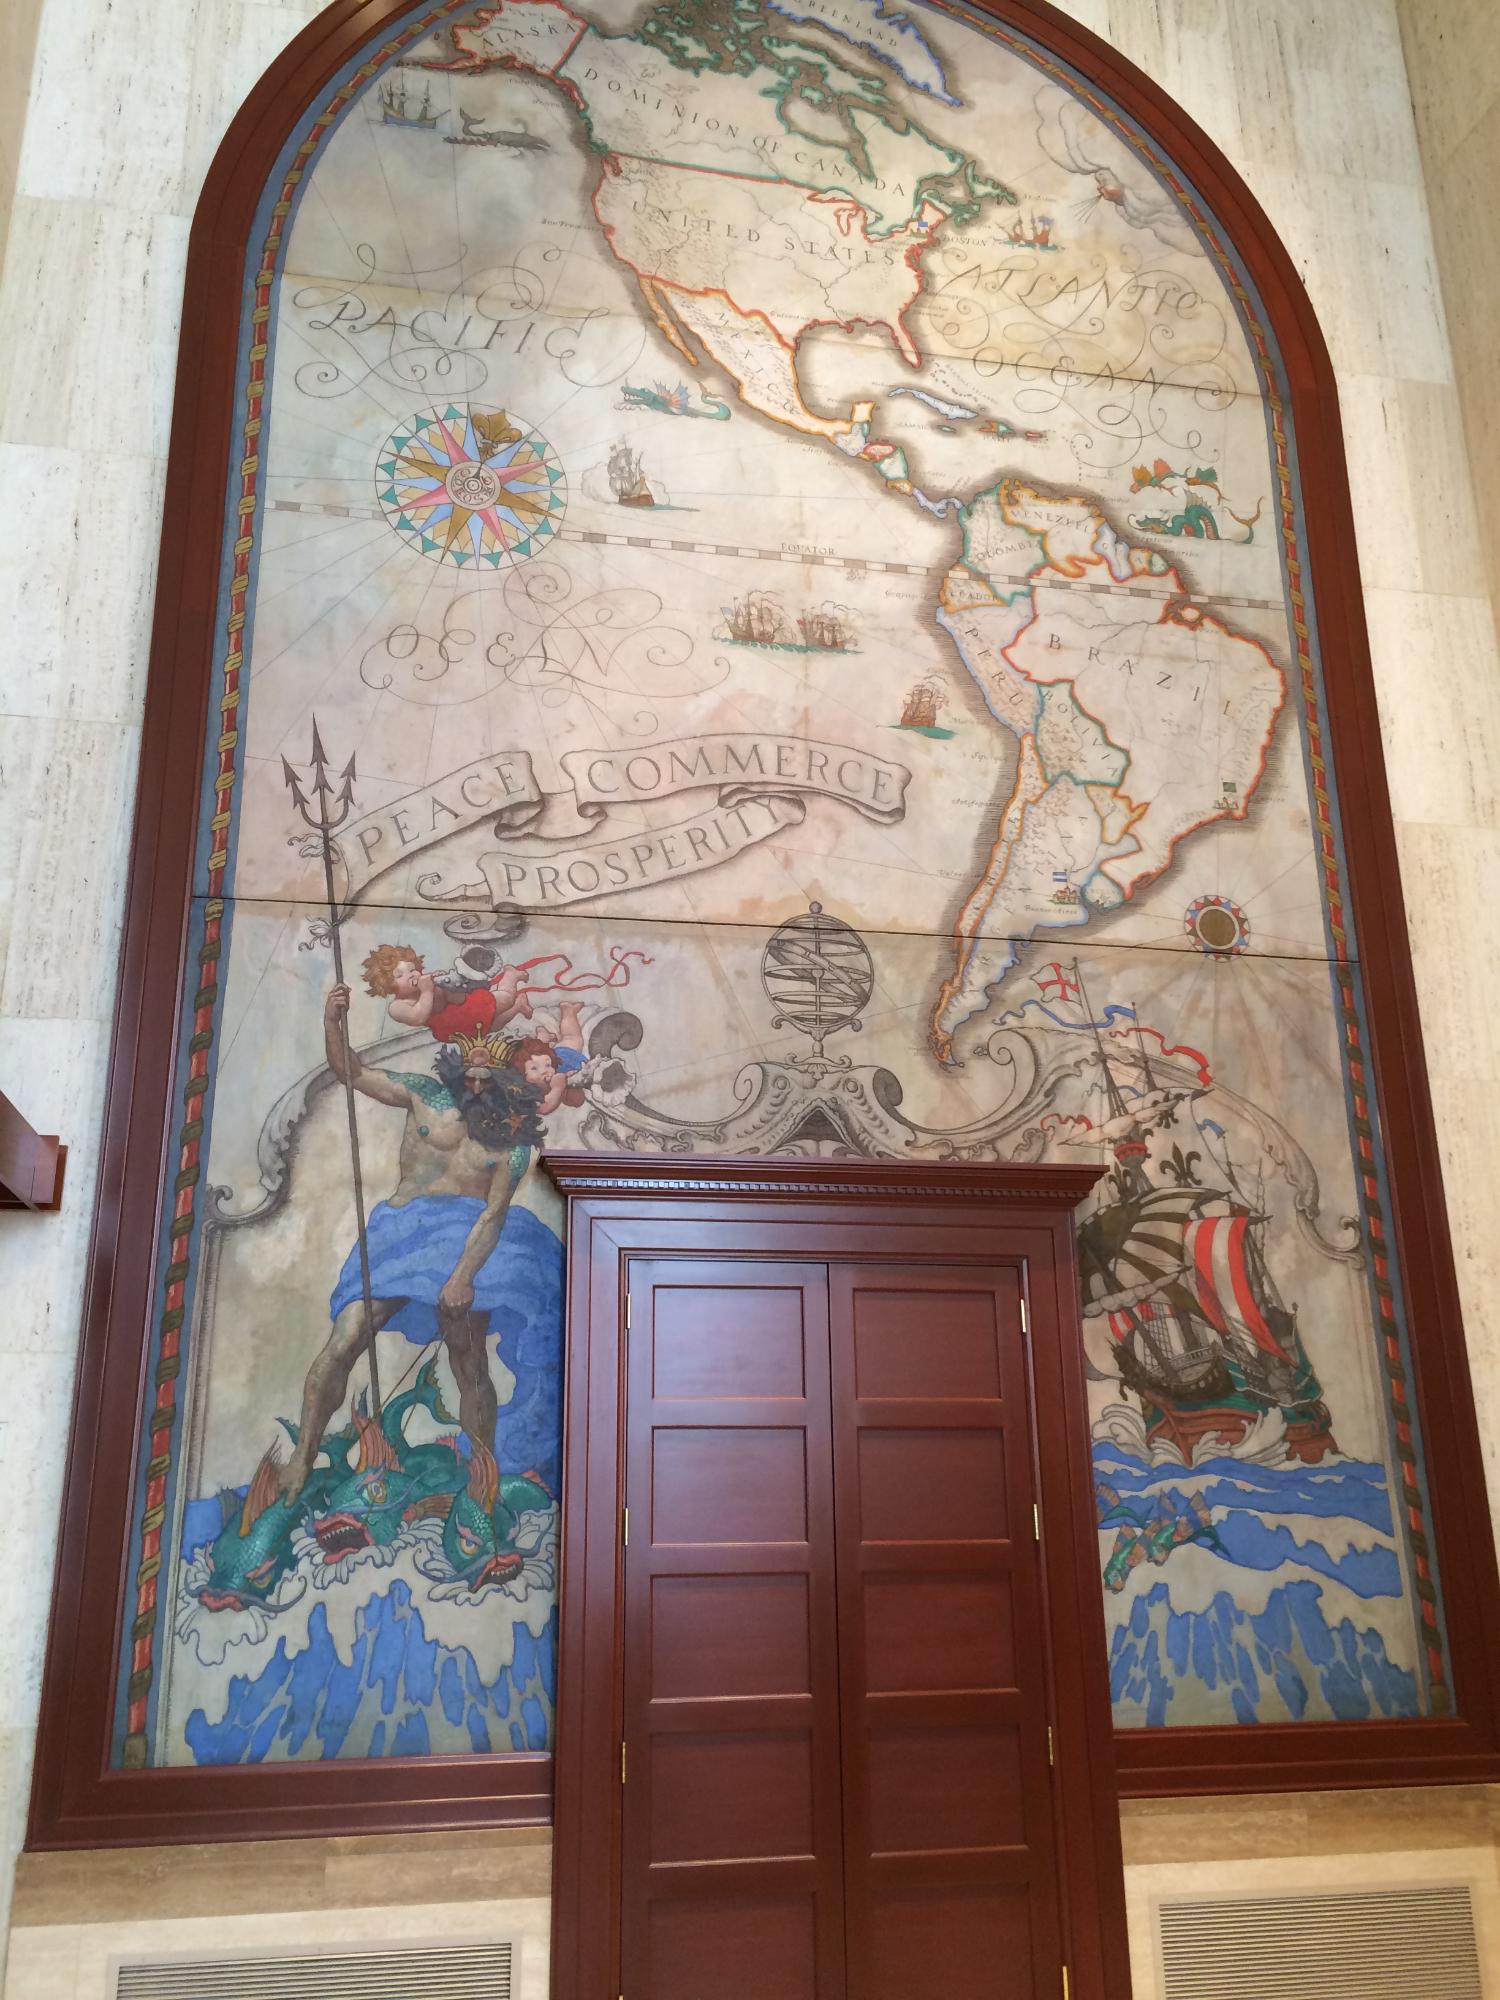 mural by N.C. Wyeth